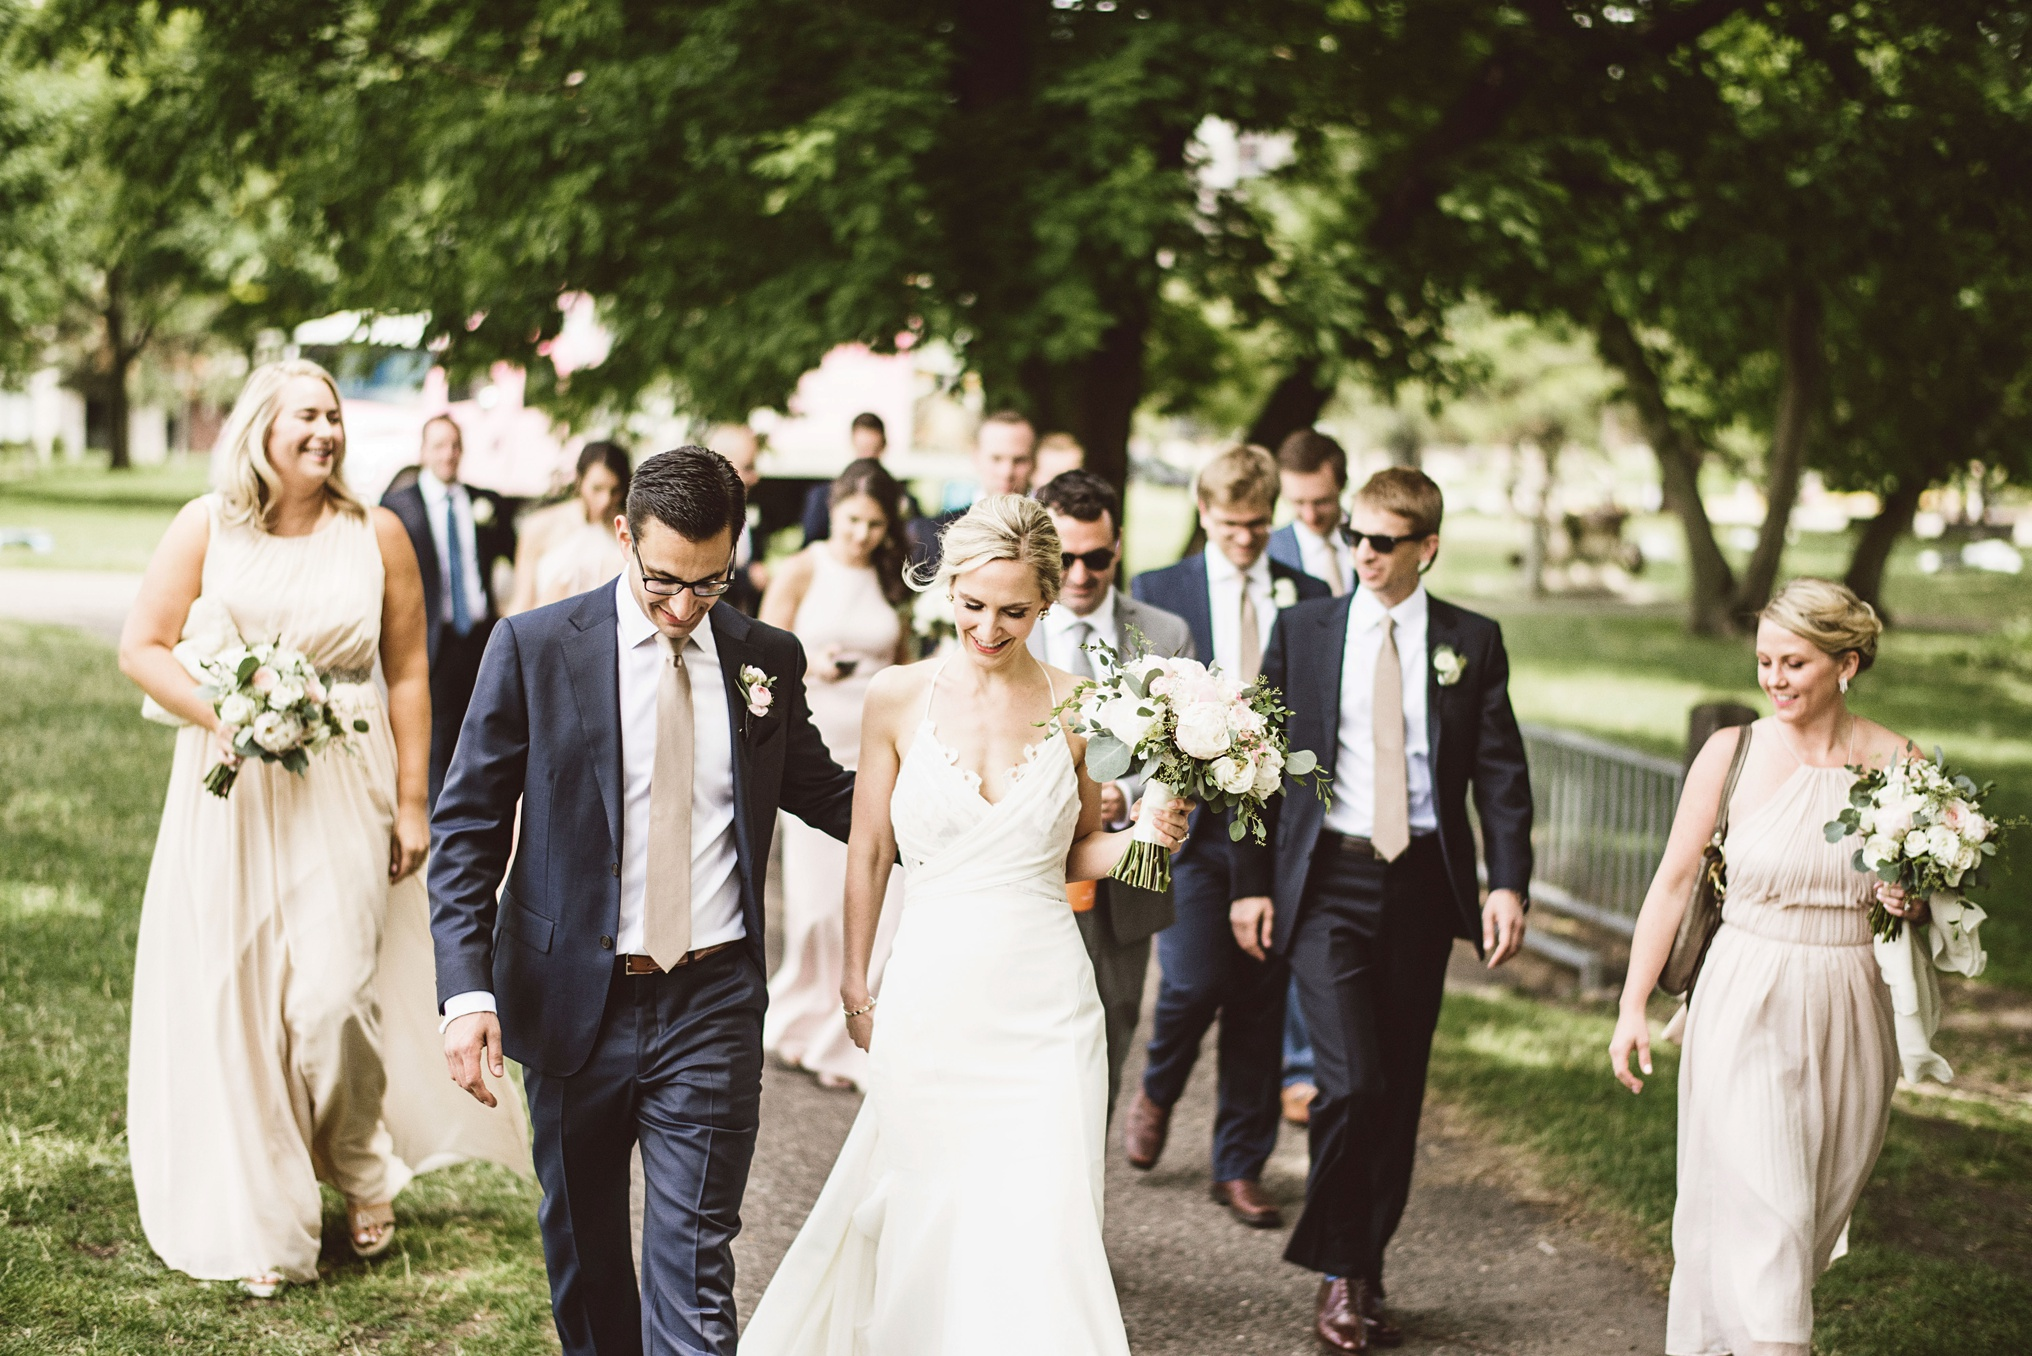 best_wedding_photography_2017_by_lucas_botz_photography_231.jpg